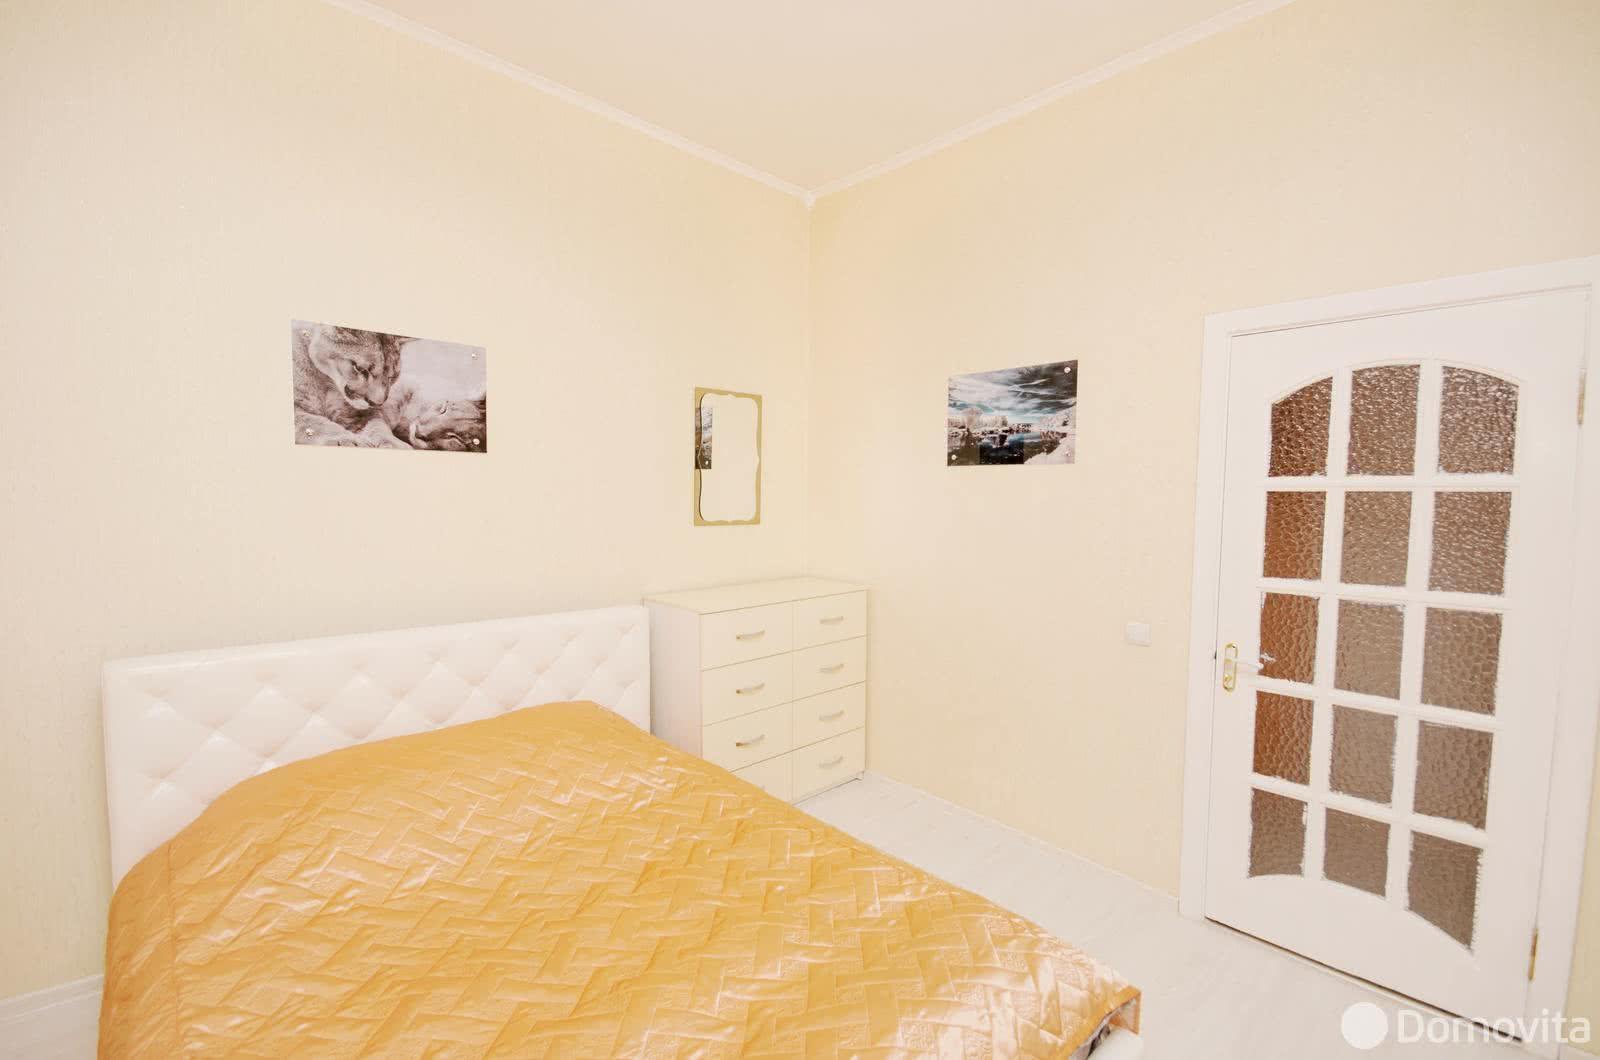 Аренда 2-комнатной квартиры на сутки в Минске пр-т Независимости, д. 40 - фото 5